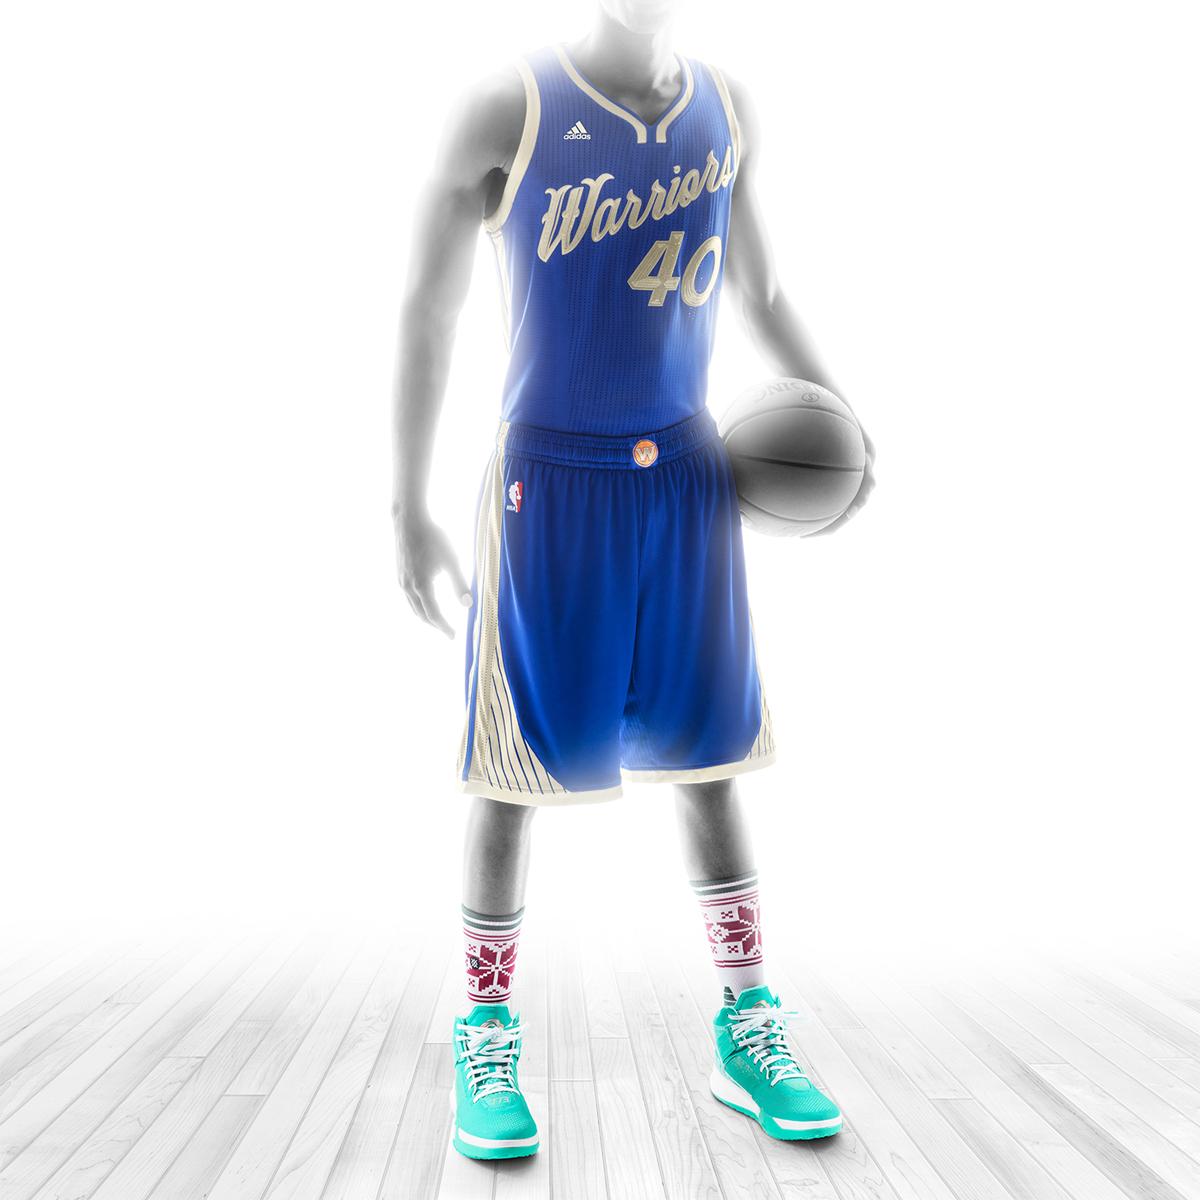 adidas Shows Off Christmas 2015 NBA Uniforms and Footwear  a095daab7